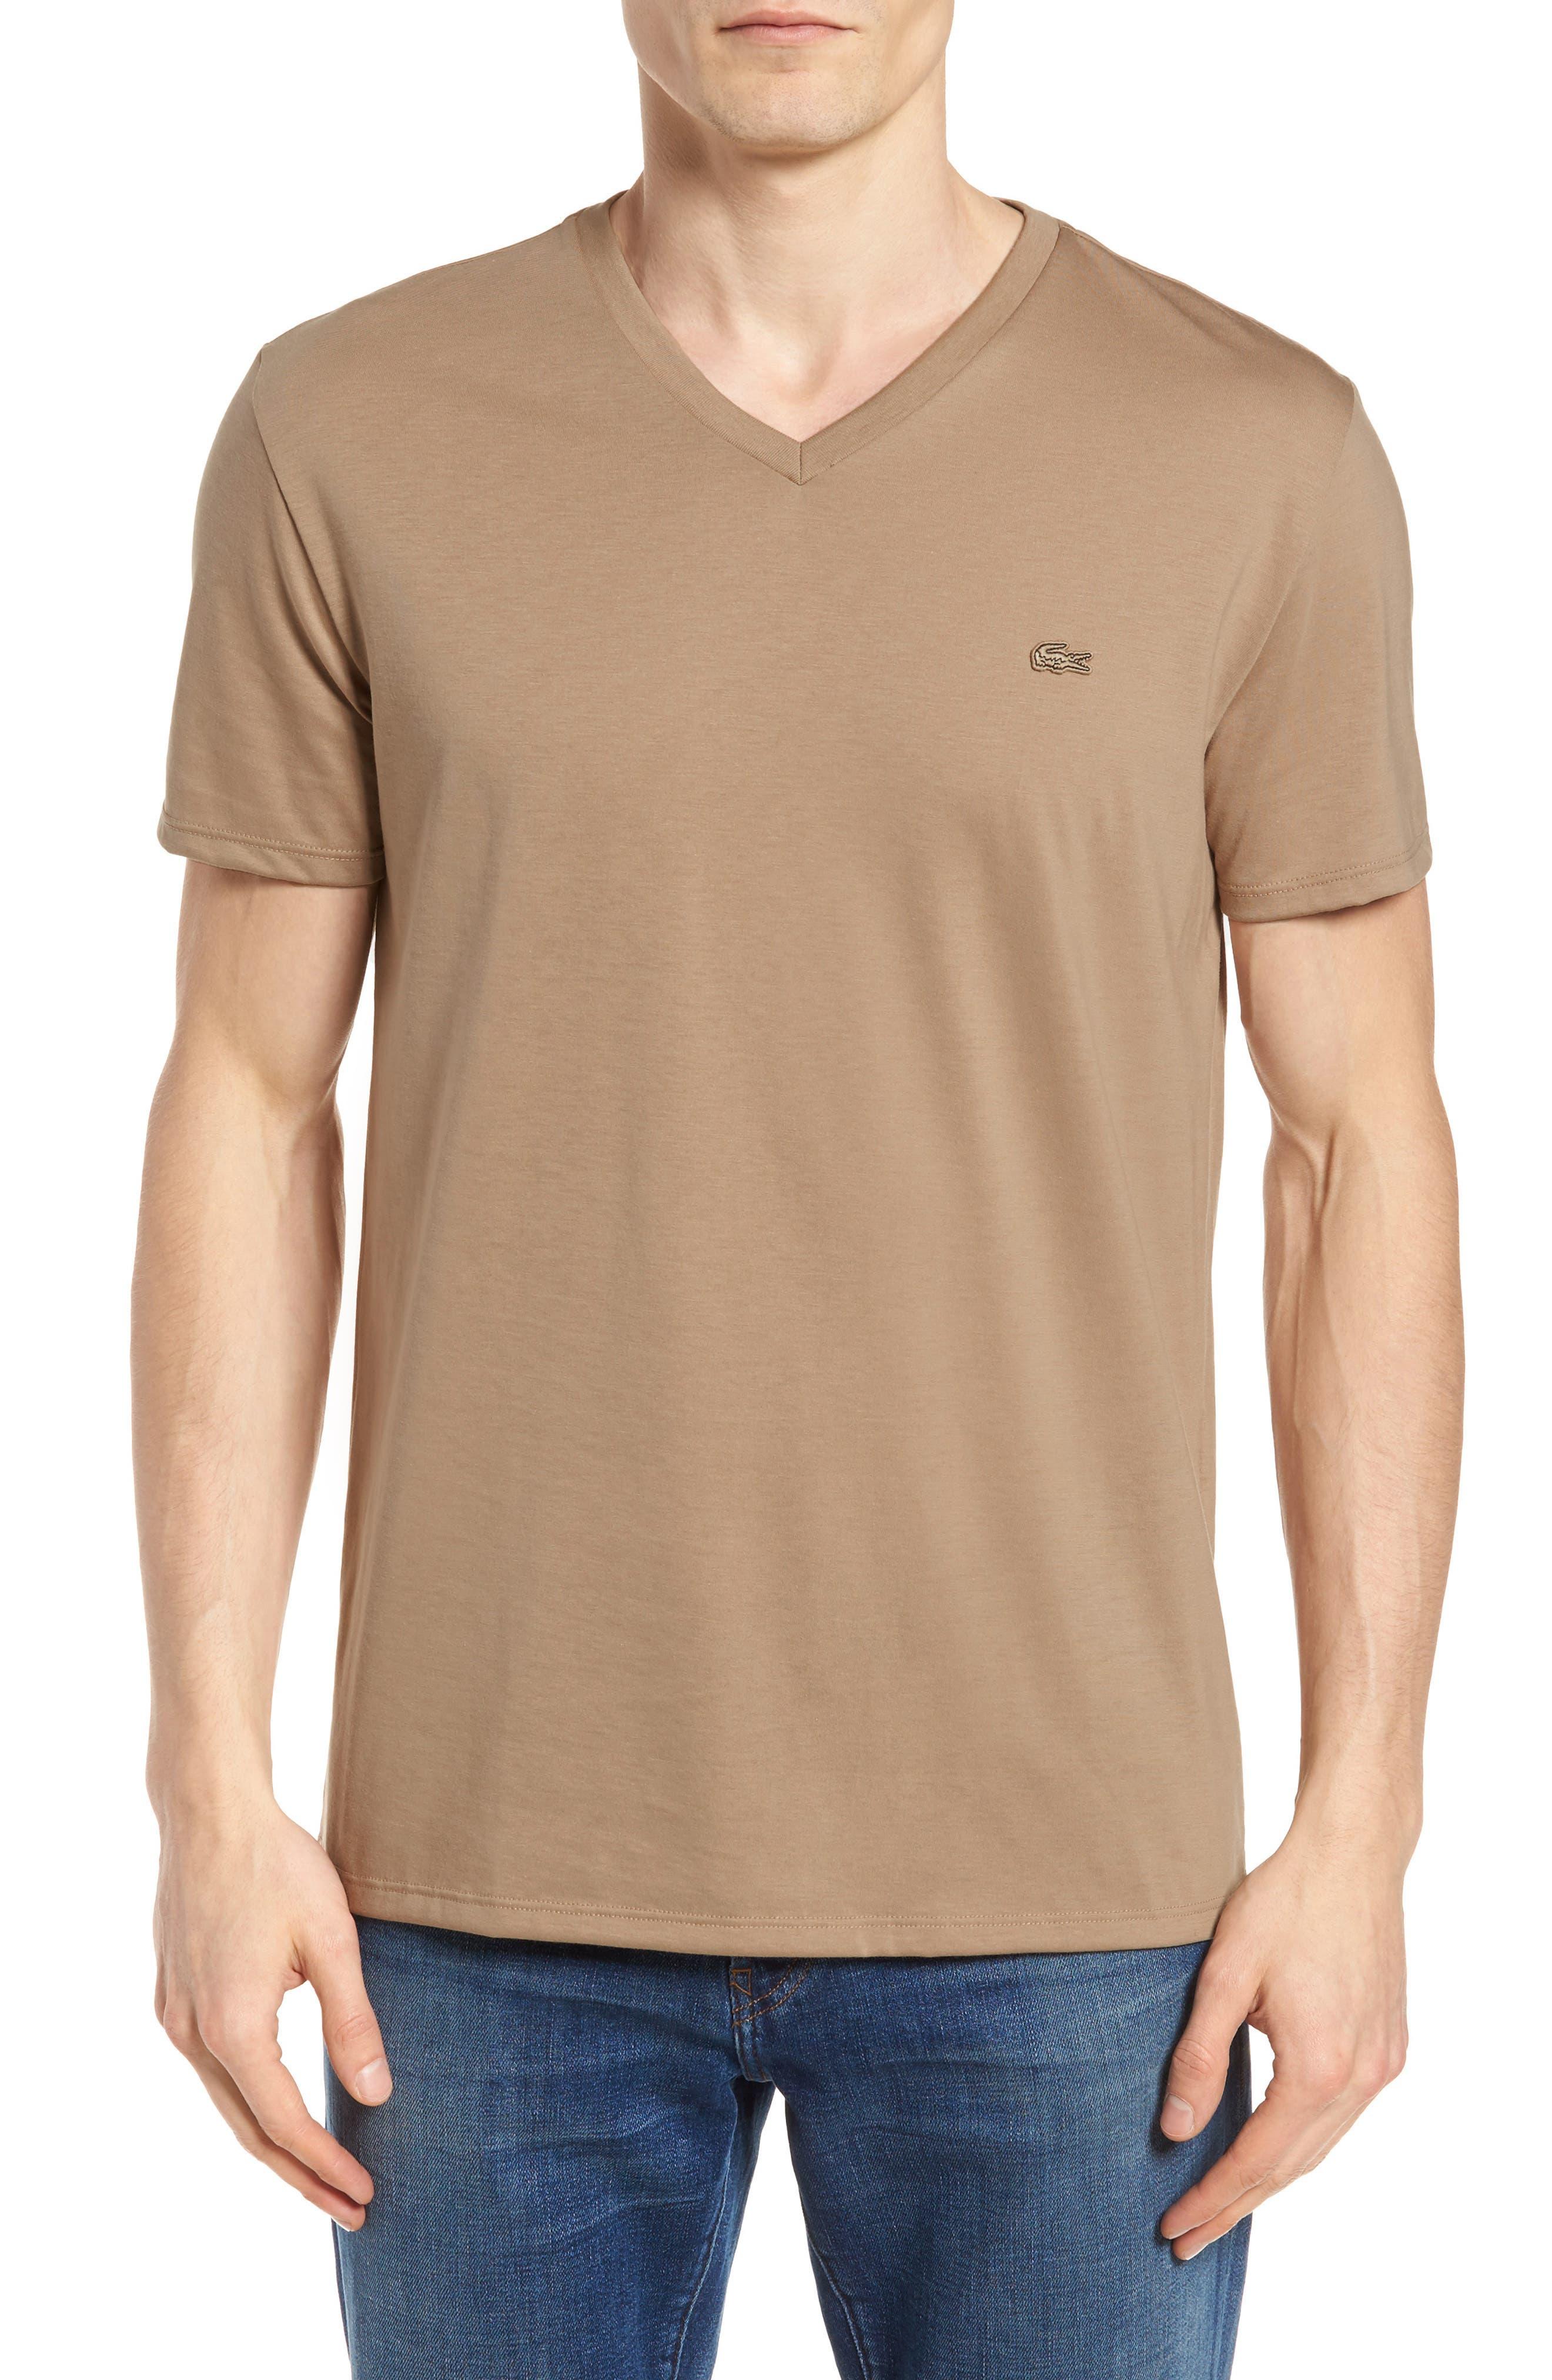 Pima Cotton T-Shirt,                             Main thumbnail 1, color,                             KRAFT BEIGE